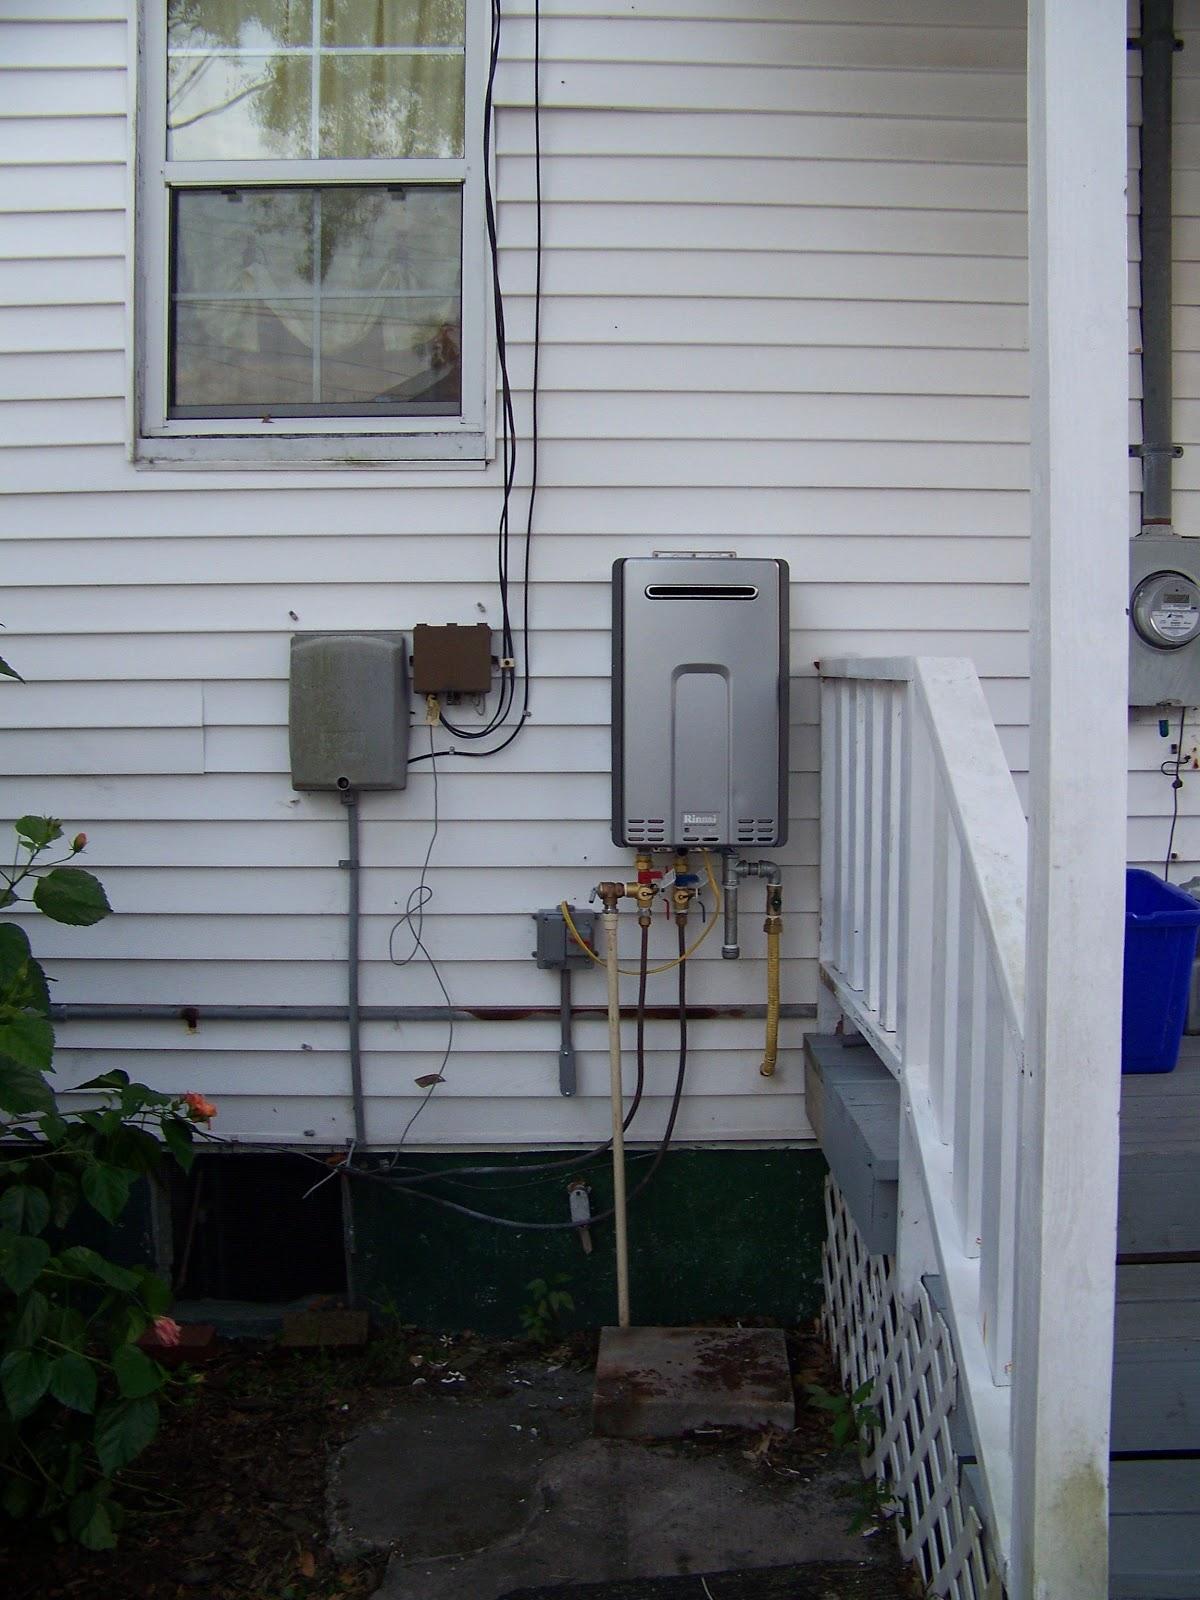 Outdoor Gas Water Heater Enclosure Bust of Outdoor Water Heater